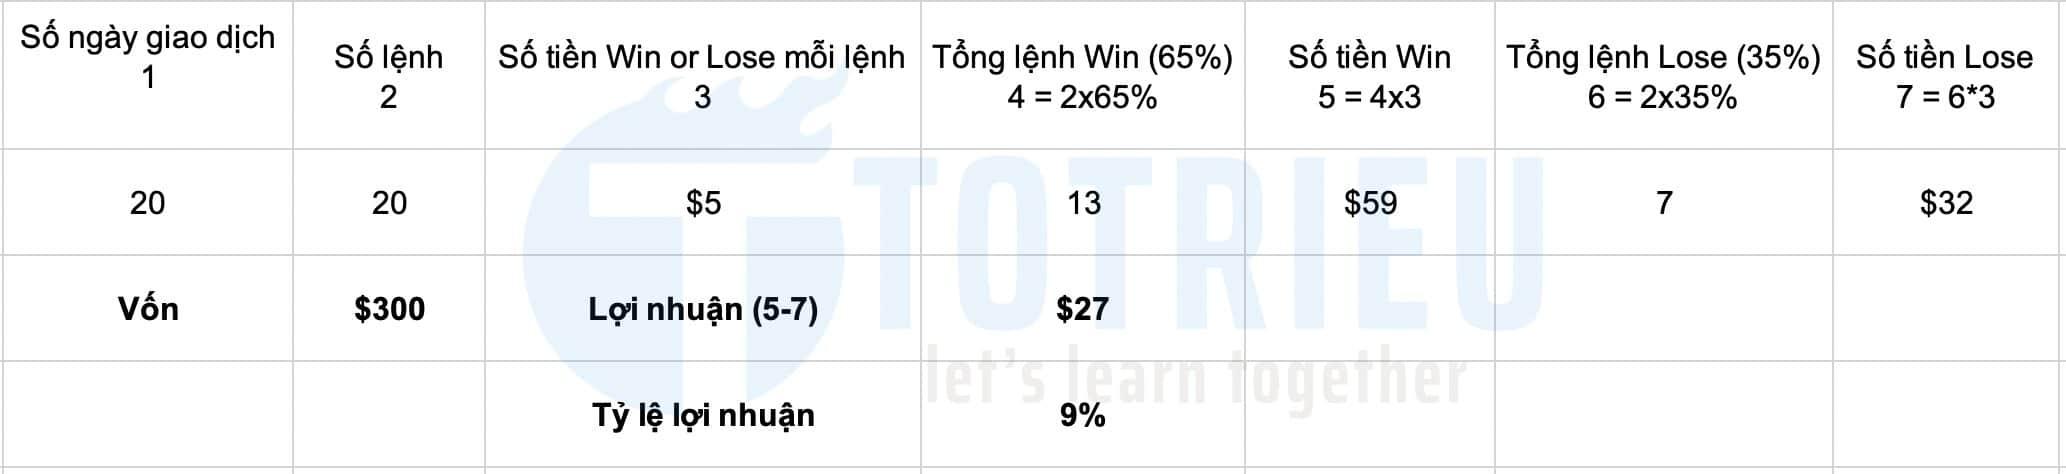 Lợi nhuận với Win Rate 65%